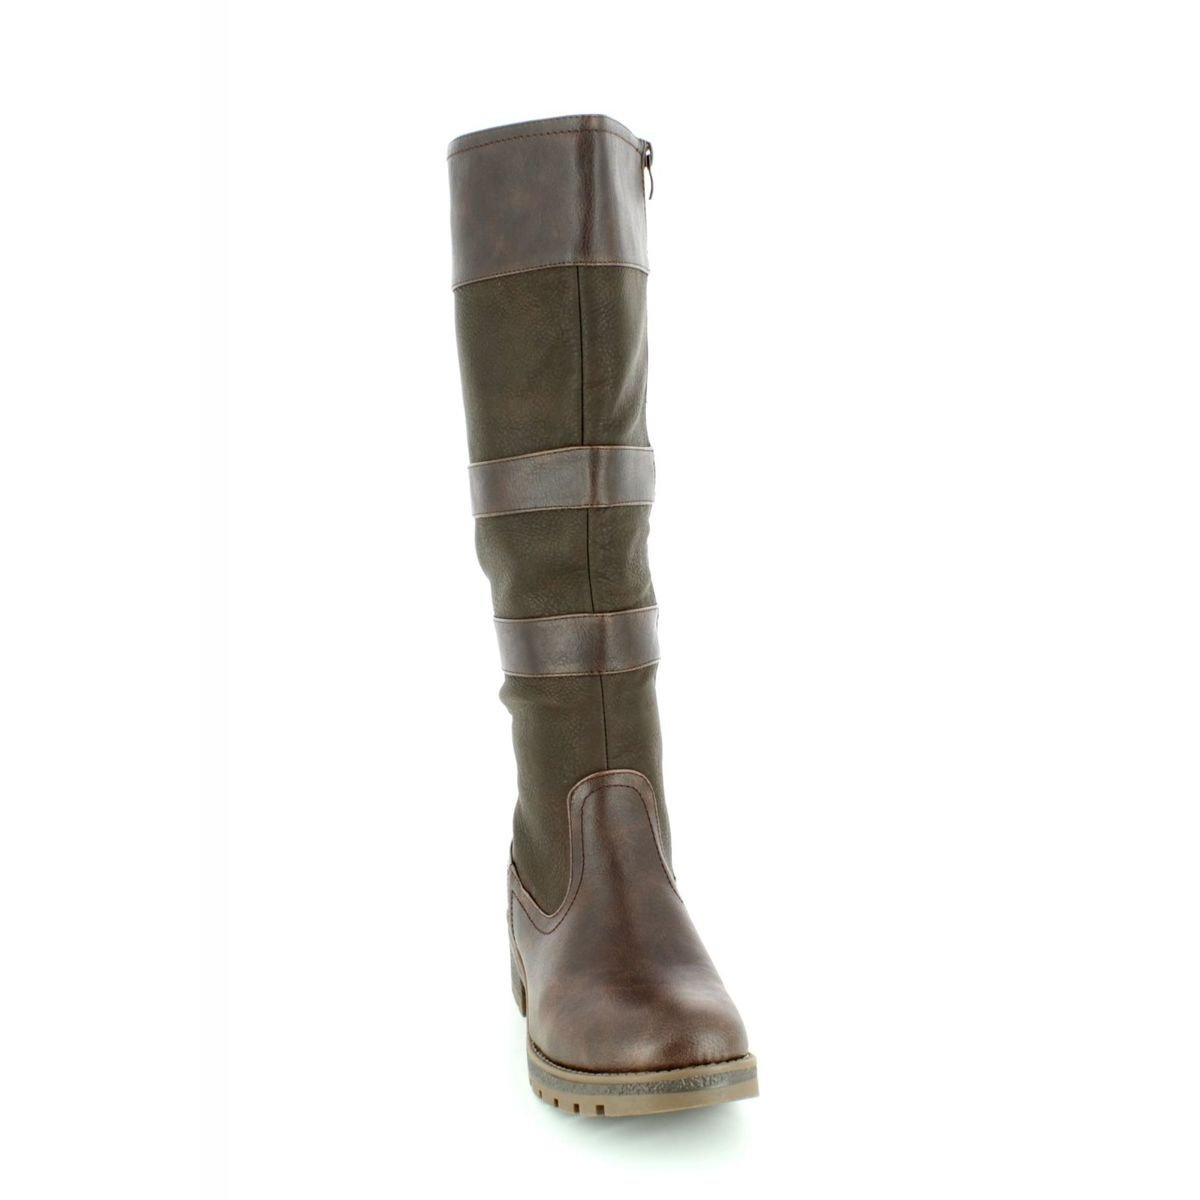 9bbc9ae7 Heavenly Feet Burley4 Colour: Chocolate, Size: EU36: Amazon.co.uk: Shoes &  Bags